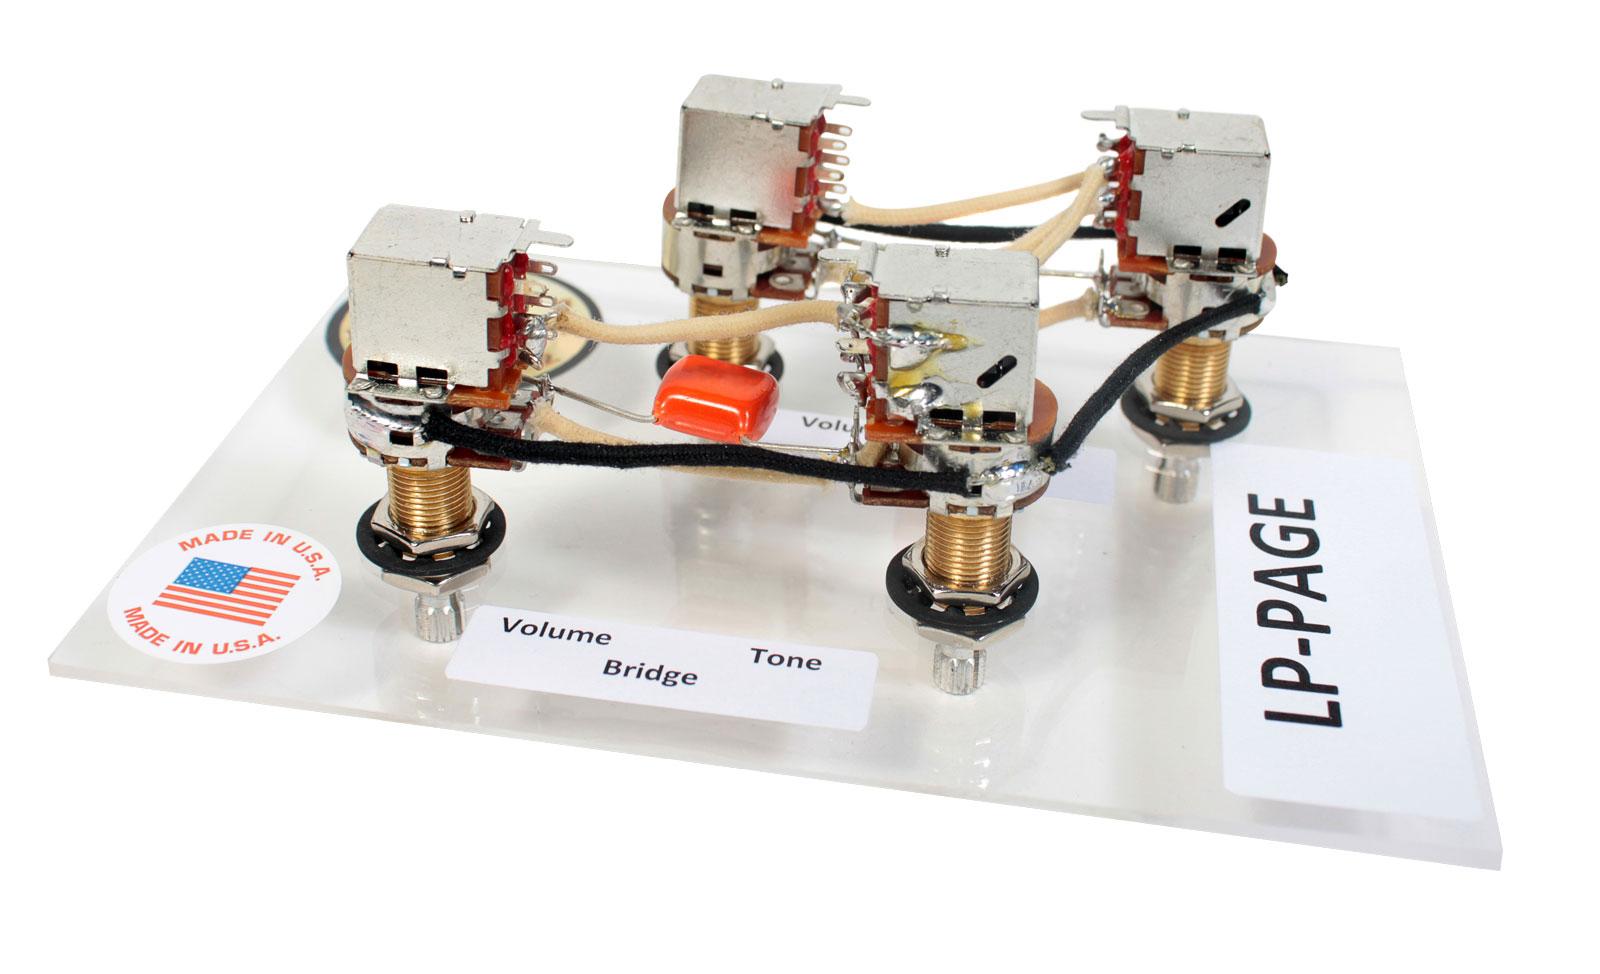 gmc jimmy fuel pump wiring harness jimmy page wiring harness